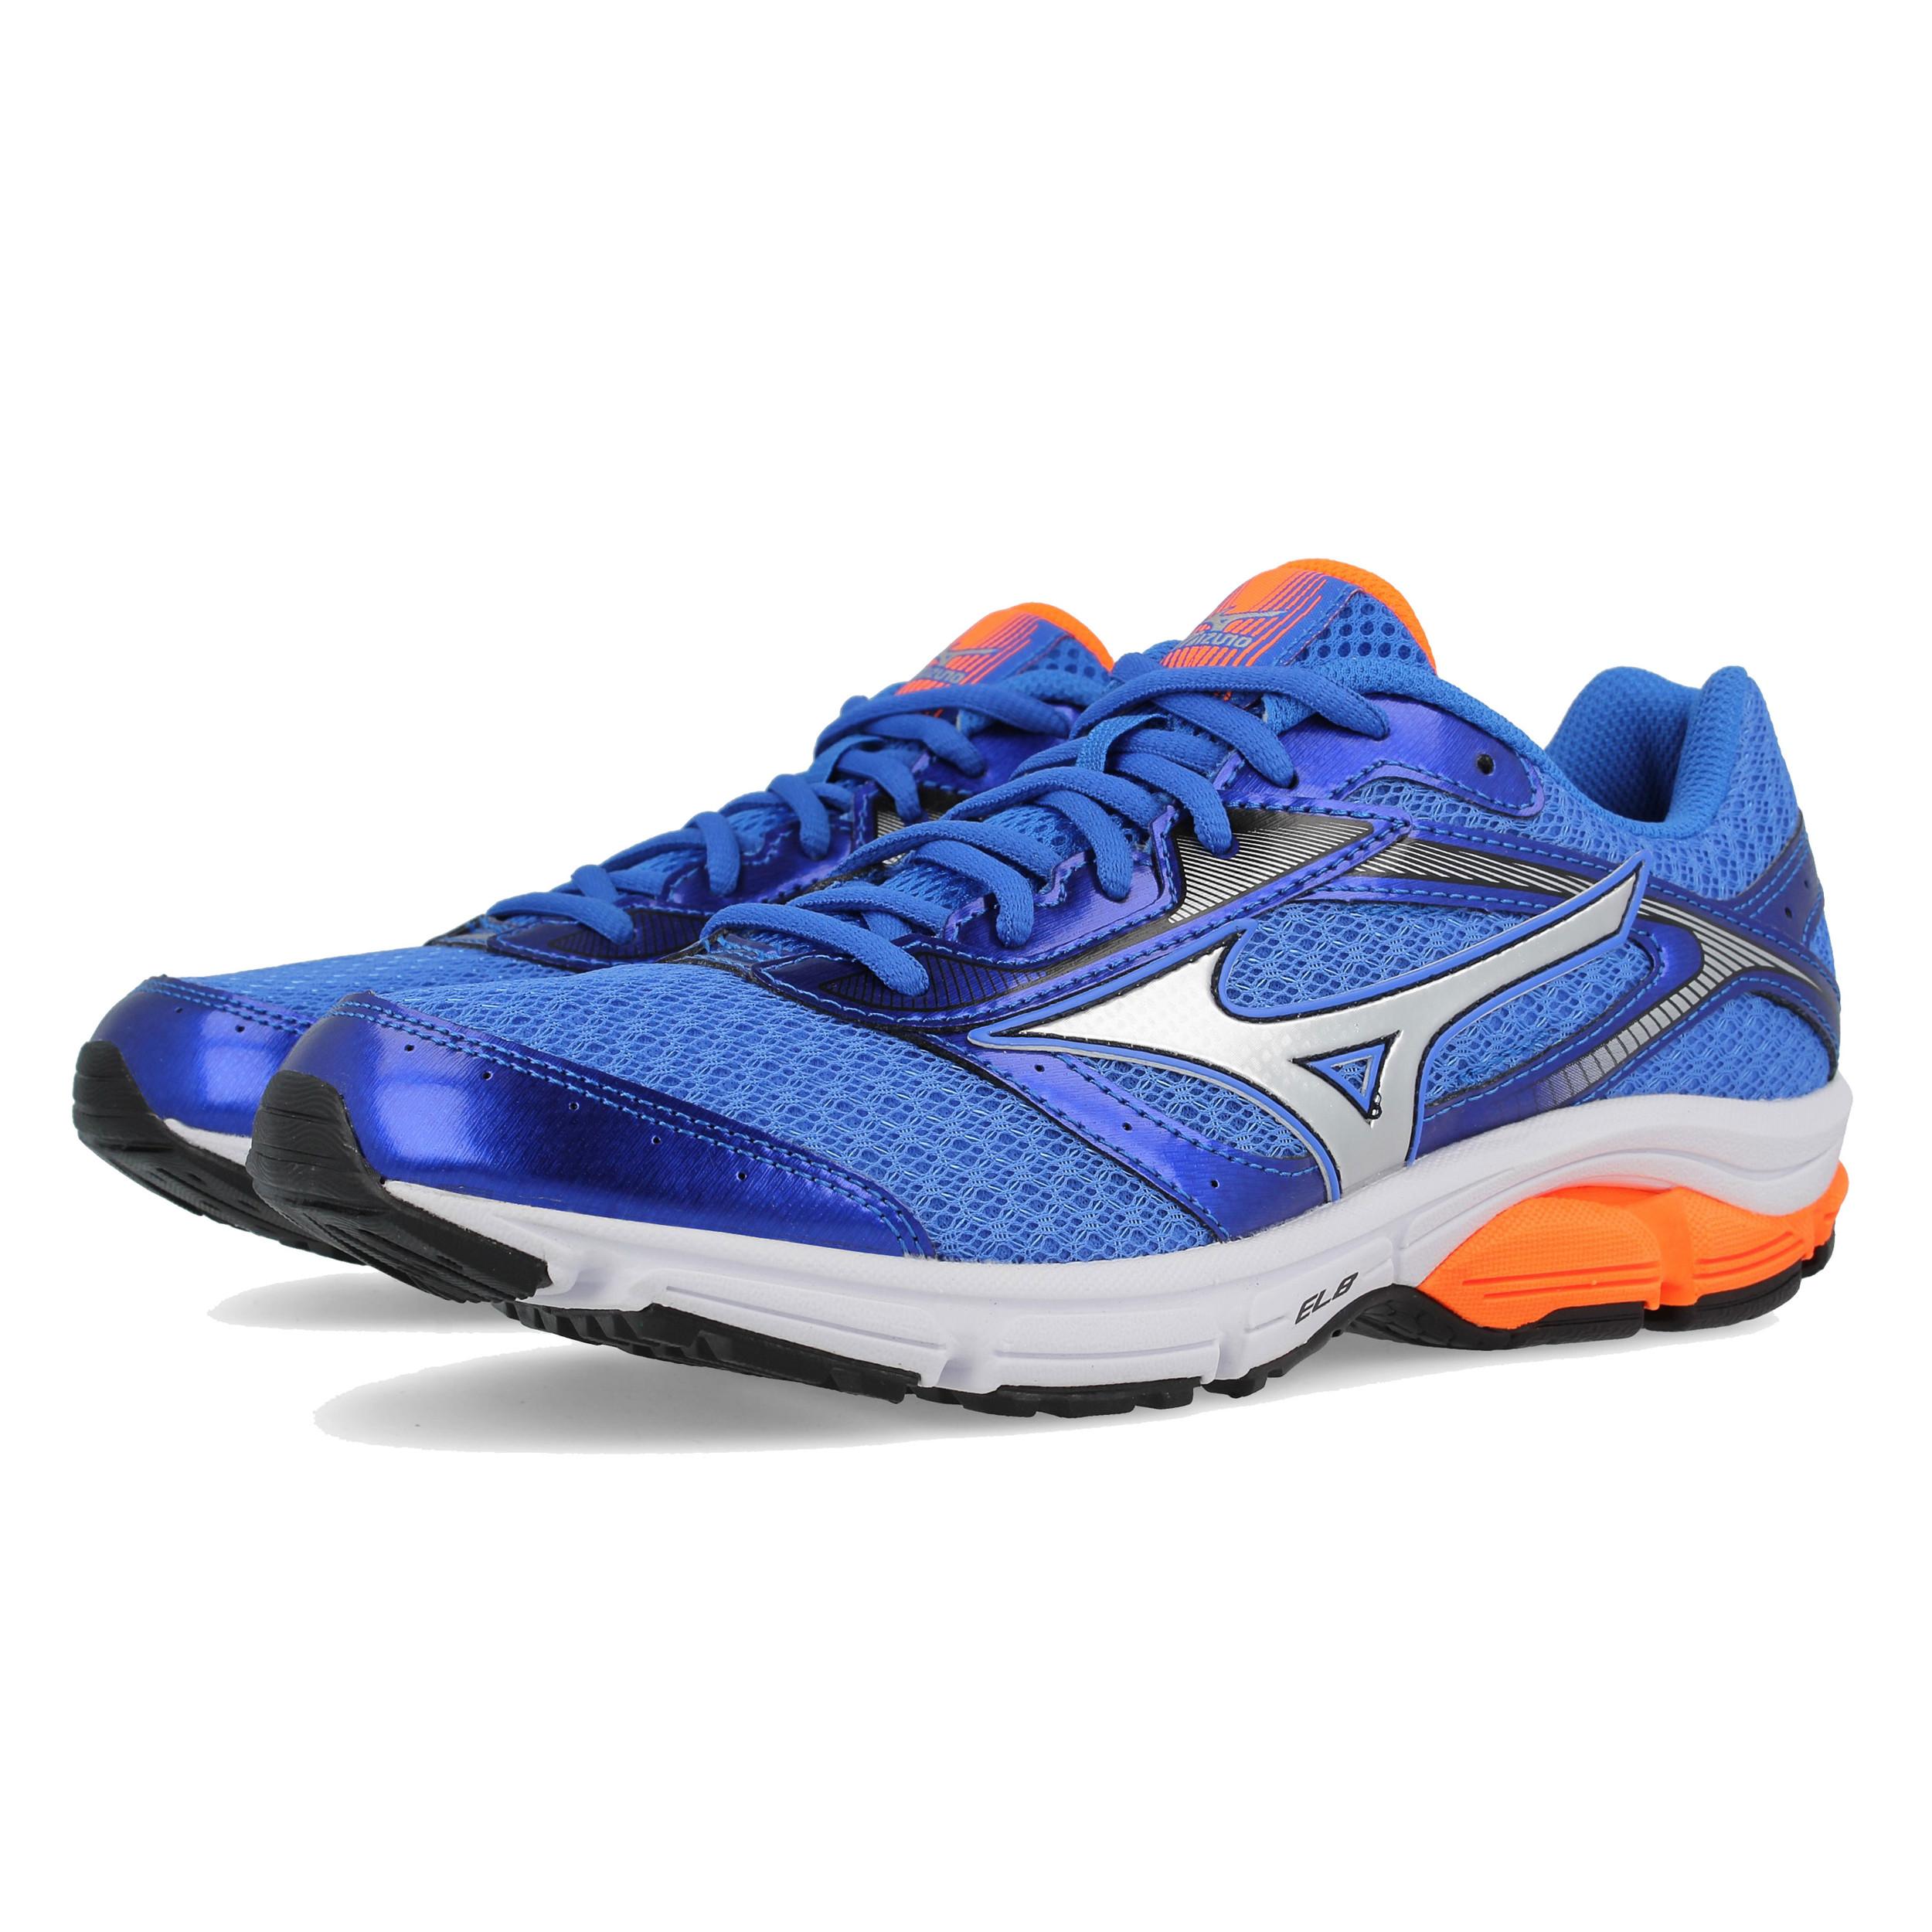 Mizuno Azul Zapatos Correr Deporte Hombre Wave Impetus Zapatillas 4 rwqrzPO